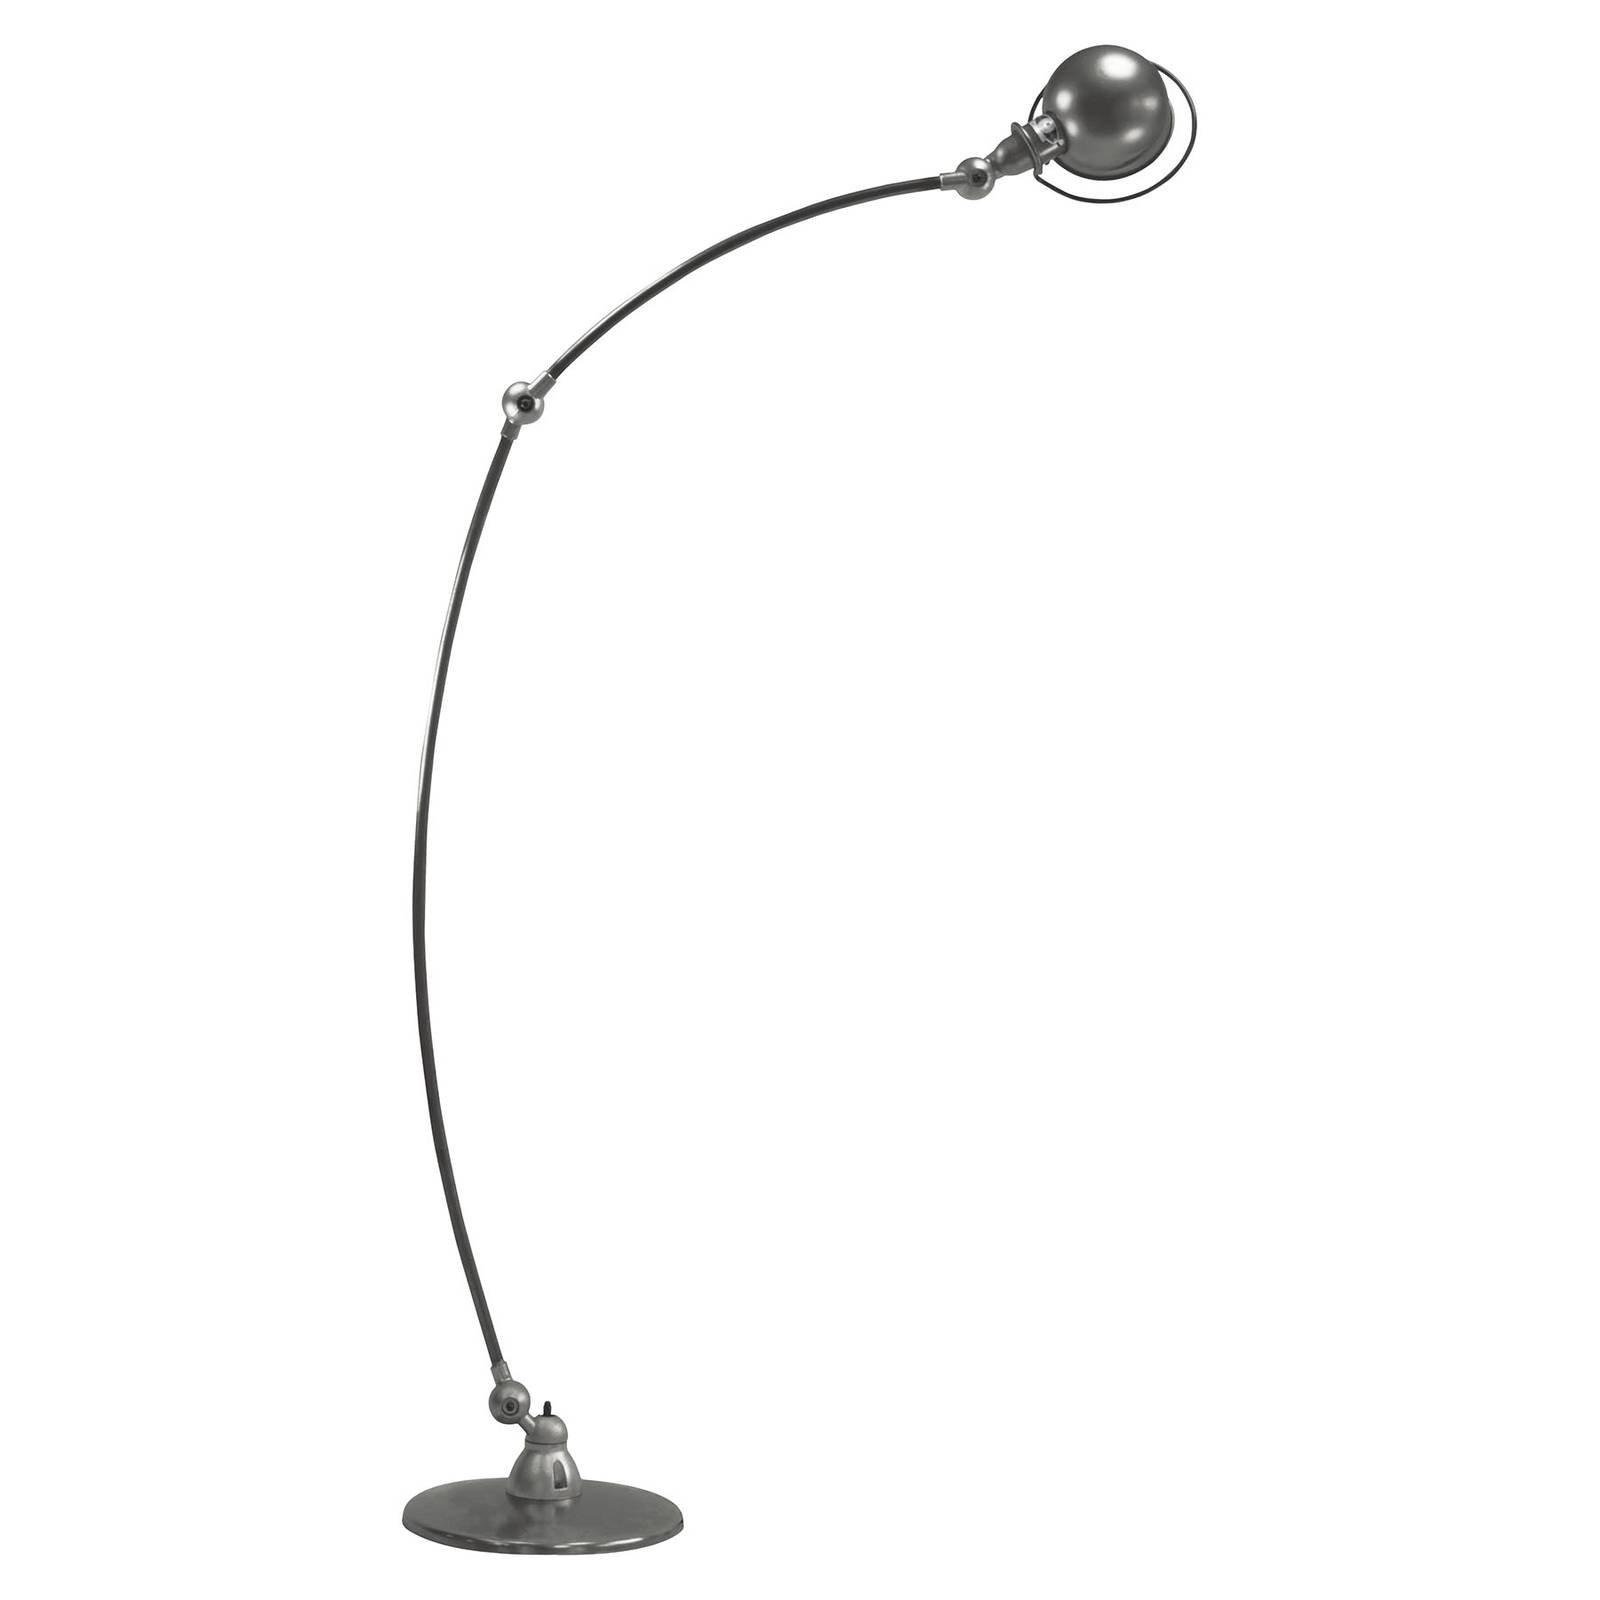 Jieldé Loft C1260 buegulvlampe, grå